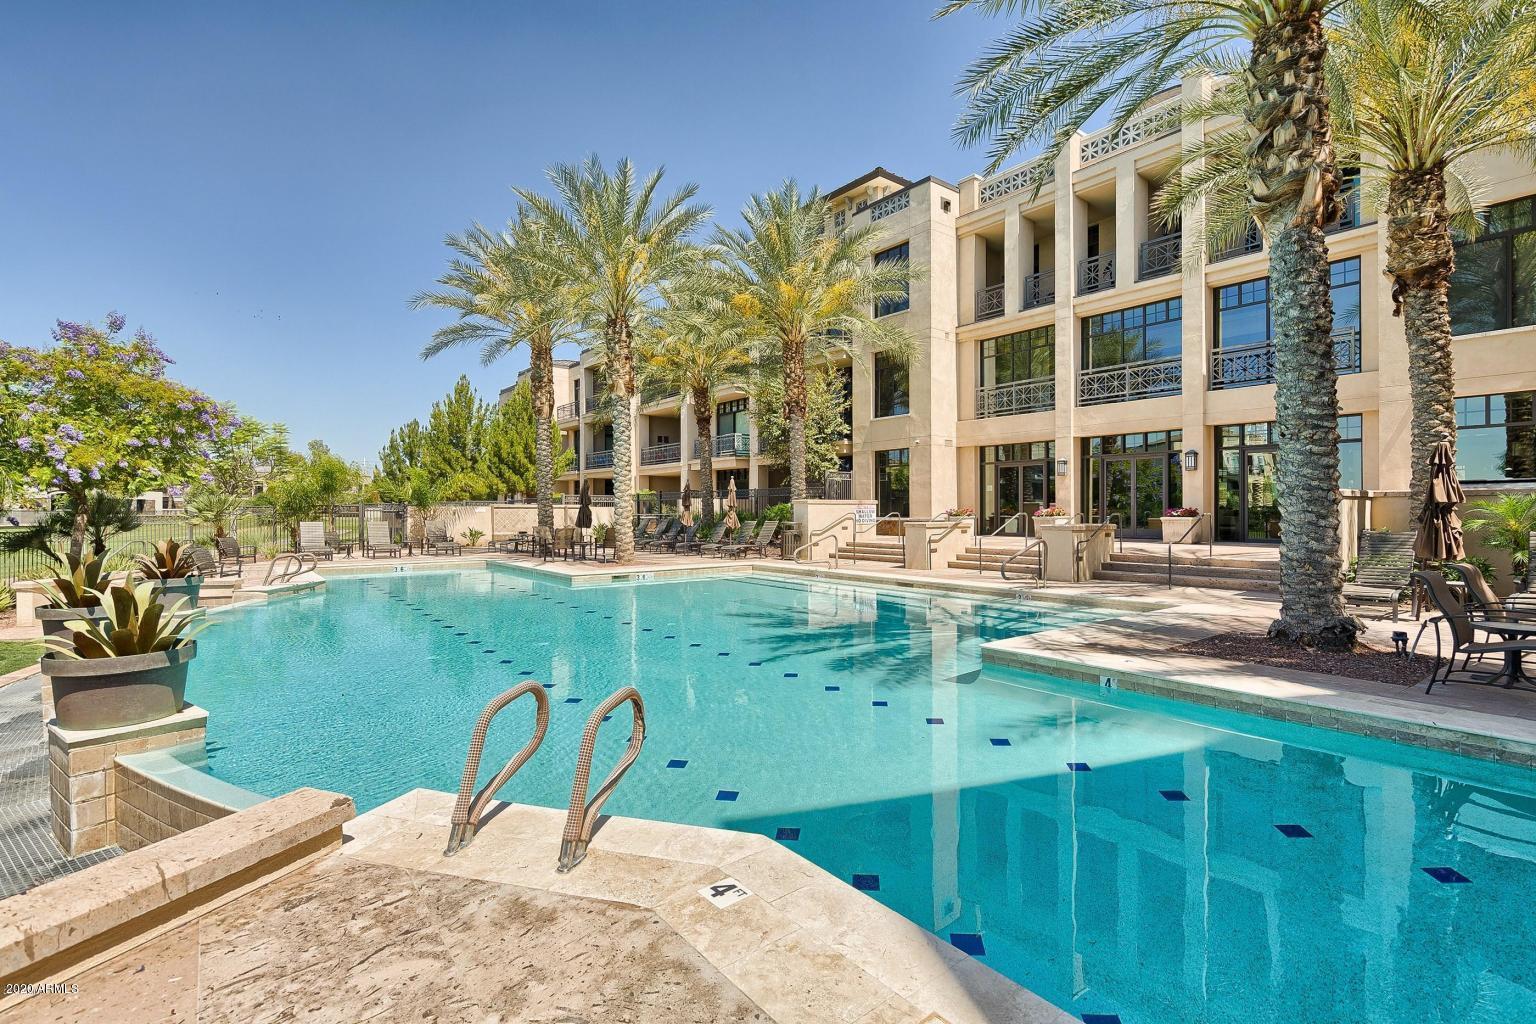 MLS 6085409 8 BILTMORE Estate Unit 121, Phoenix, AZ 85016 Phoenix AZ Two Bedroom